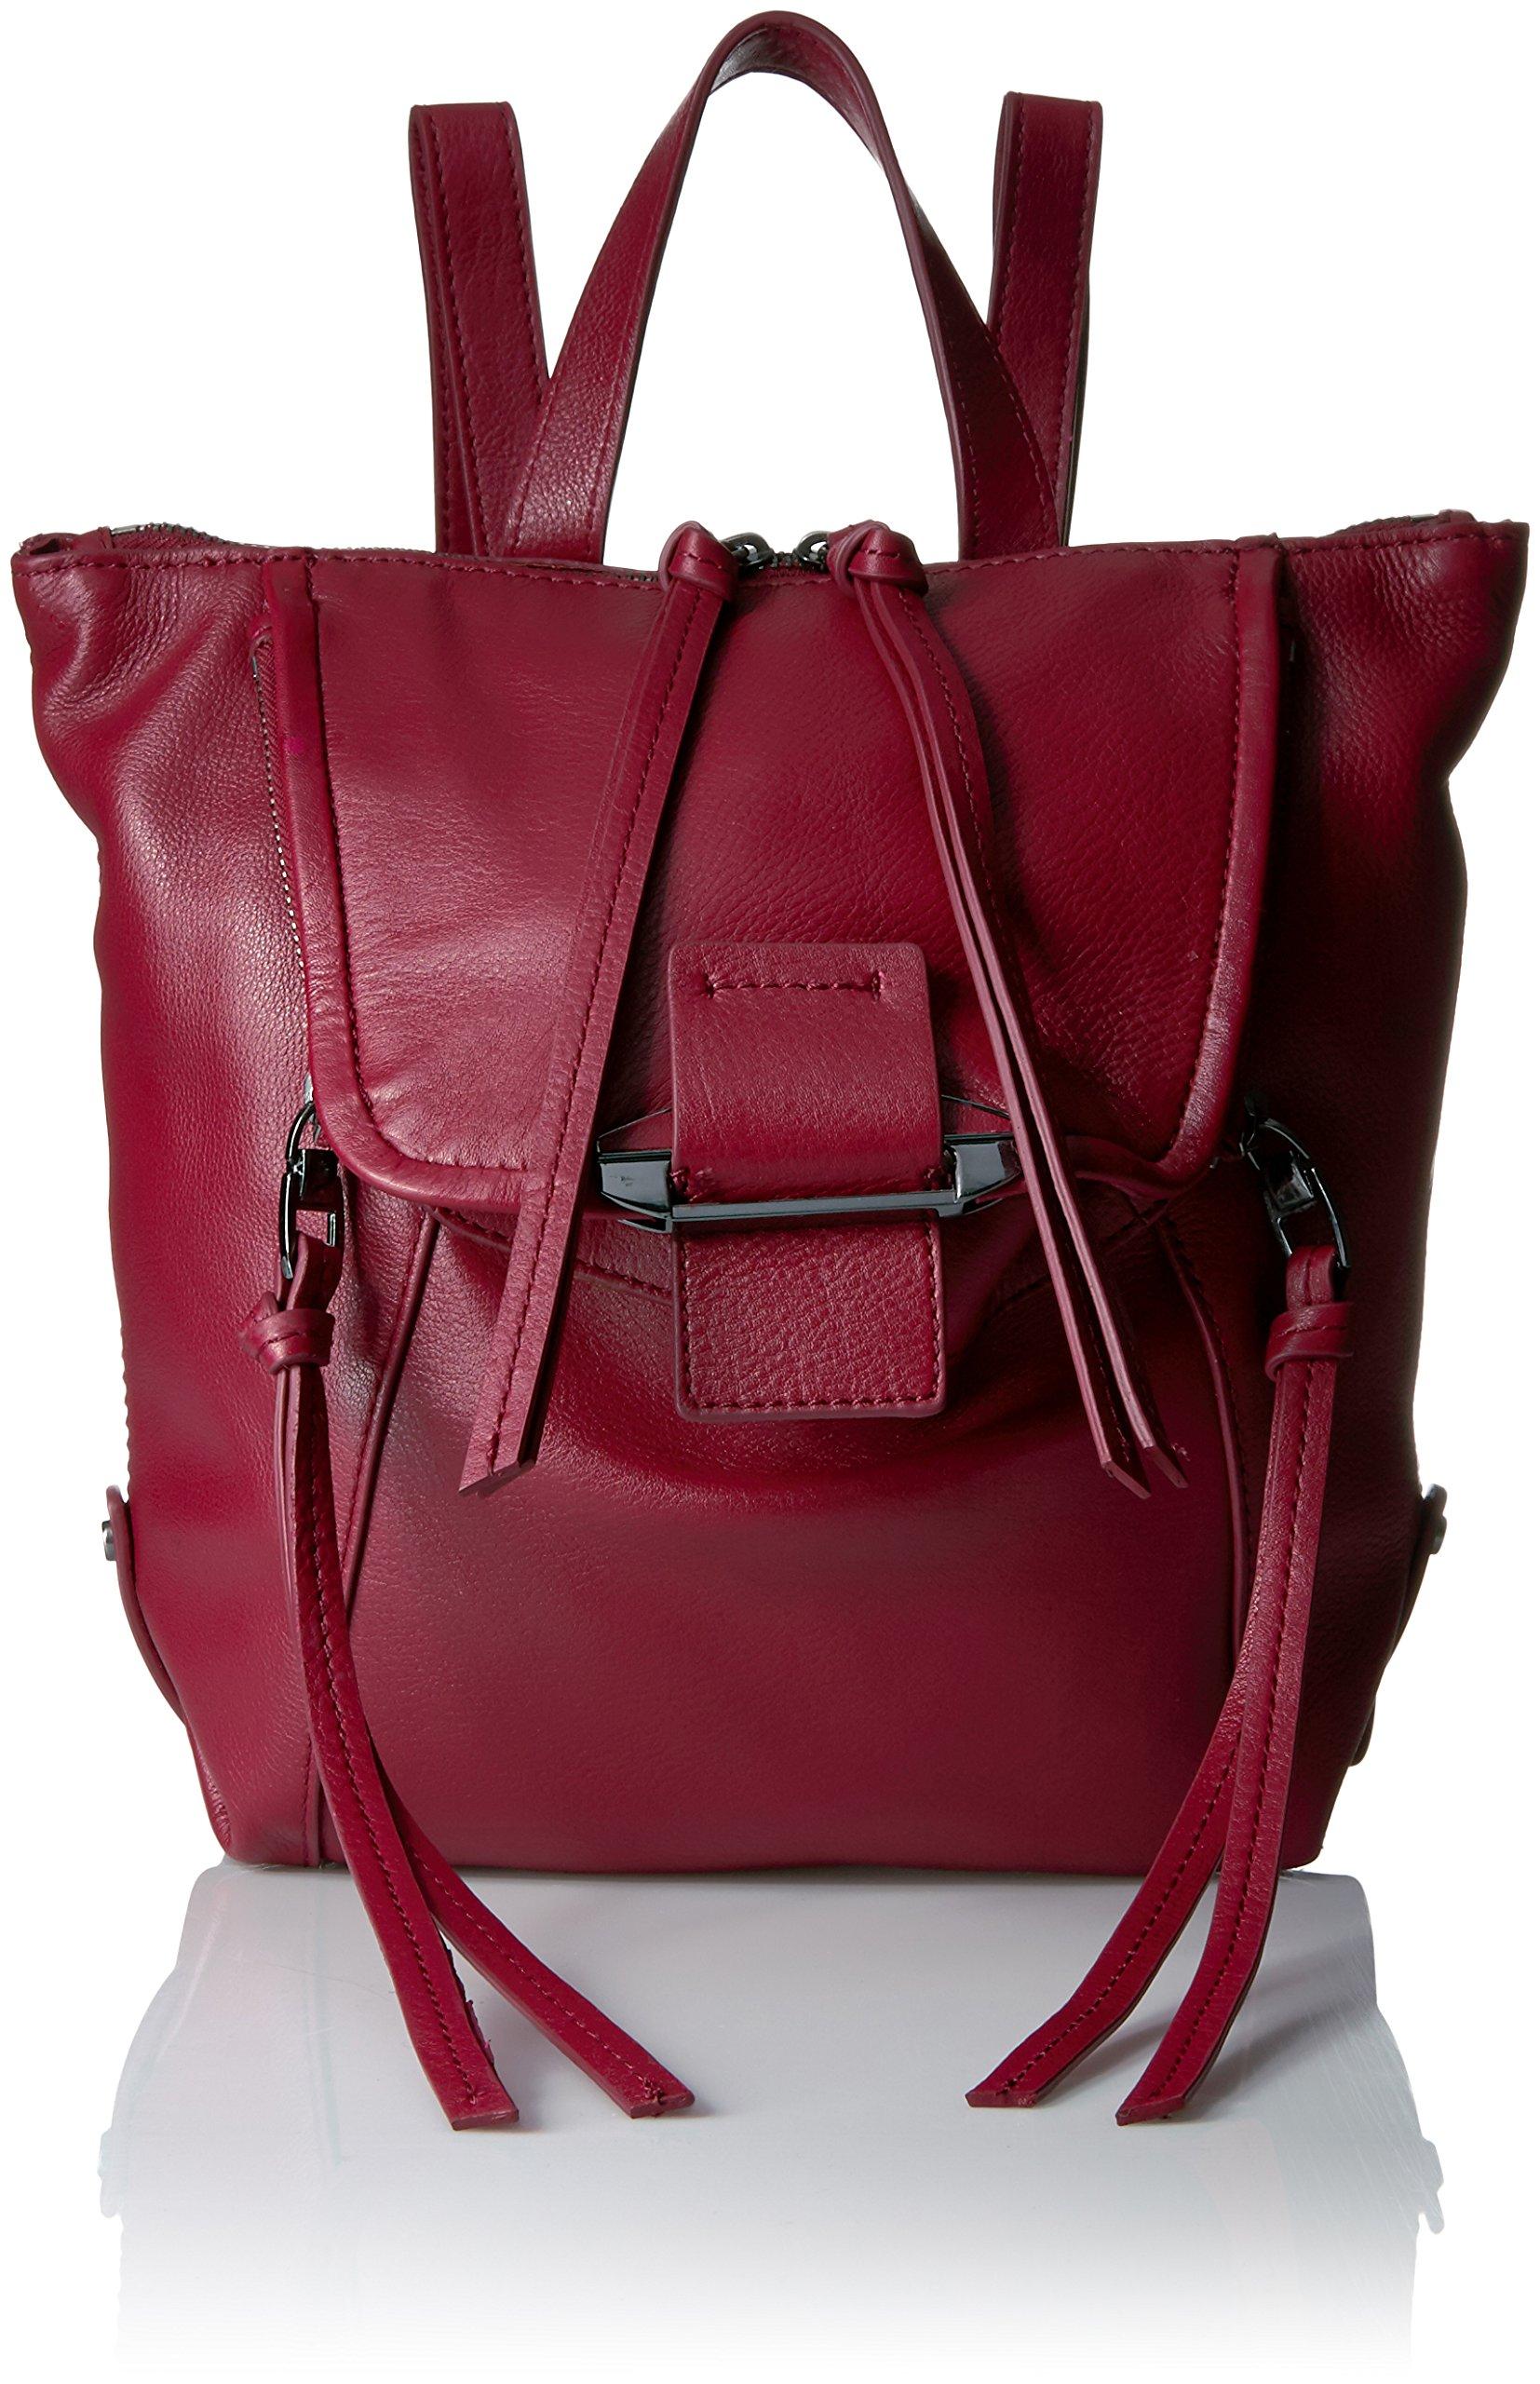 Kooba Handbags Bobbi Mini Backpack, Raspberry